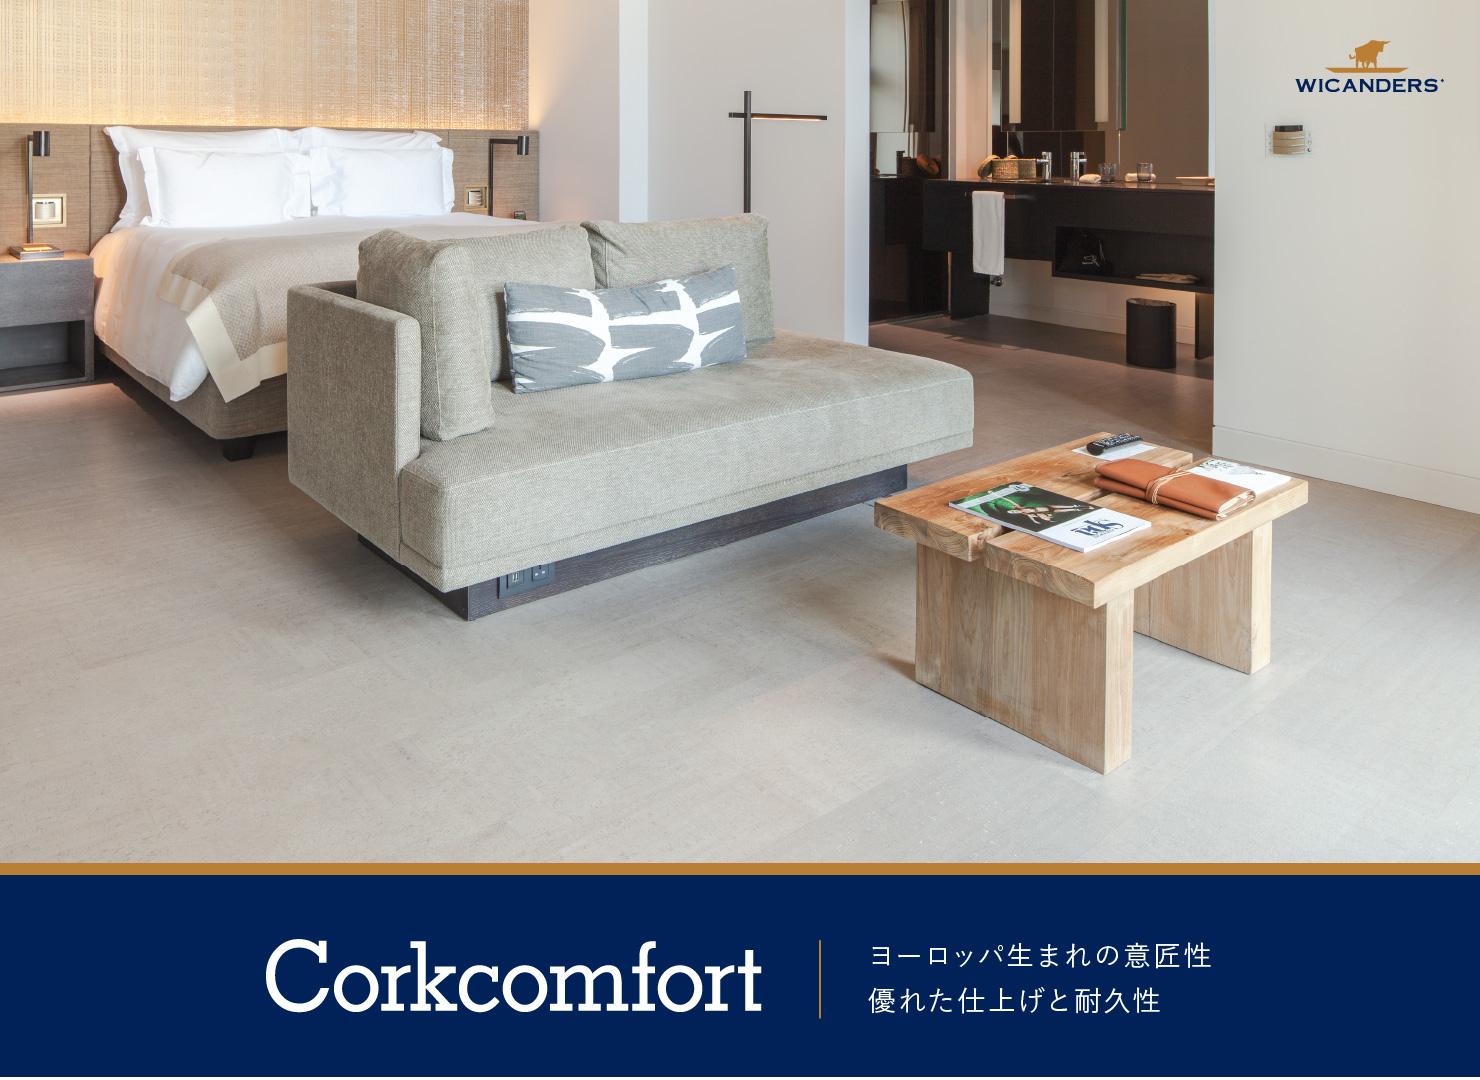 Corkcomfort ヨーロッパ生まれの意匠性 優れた仕上げと耐久性